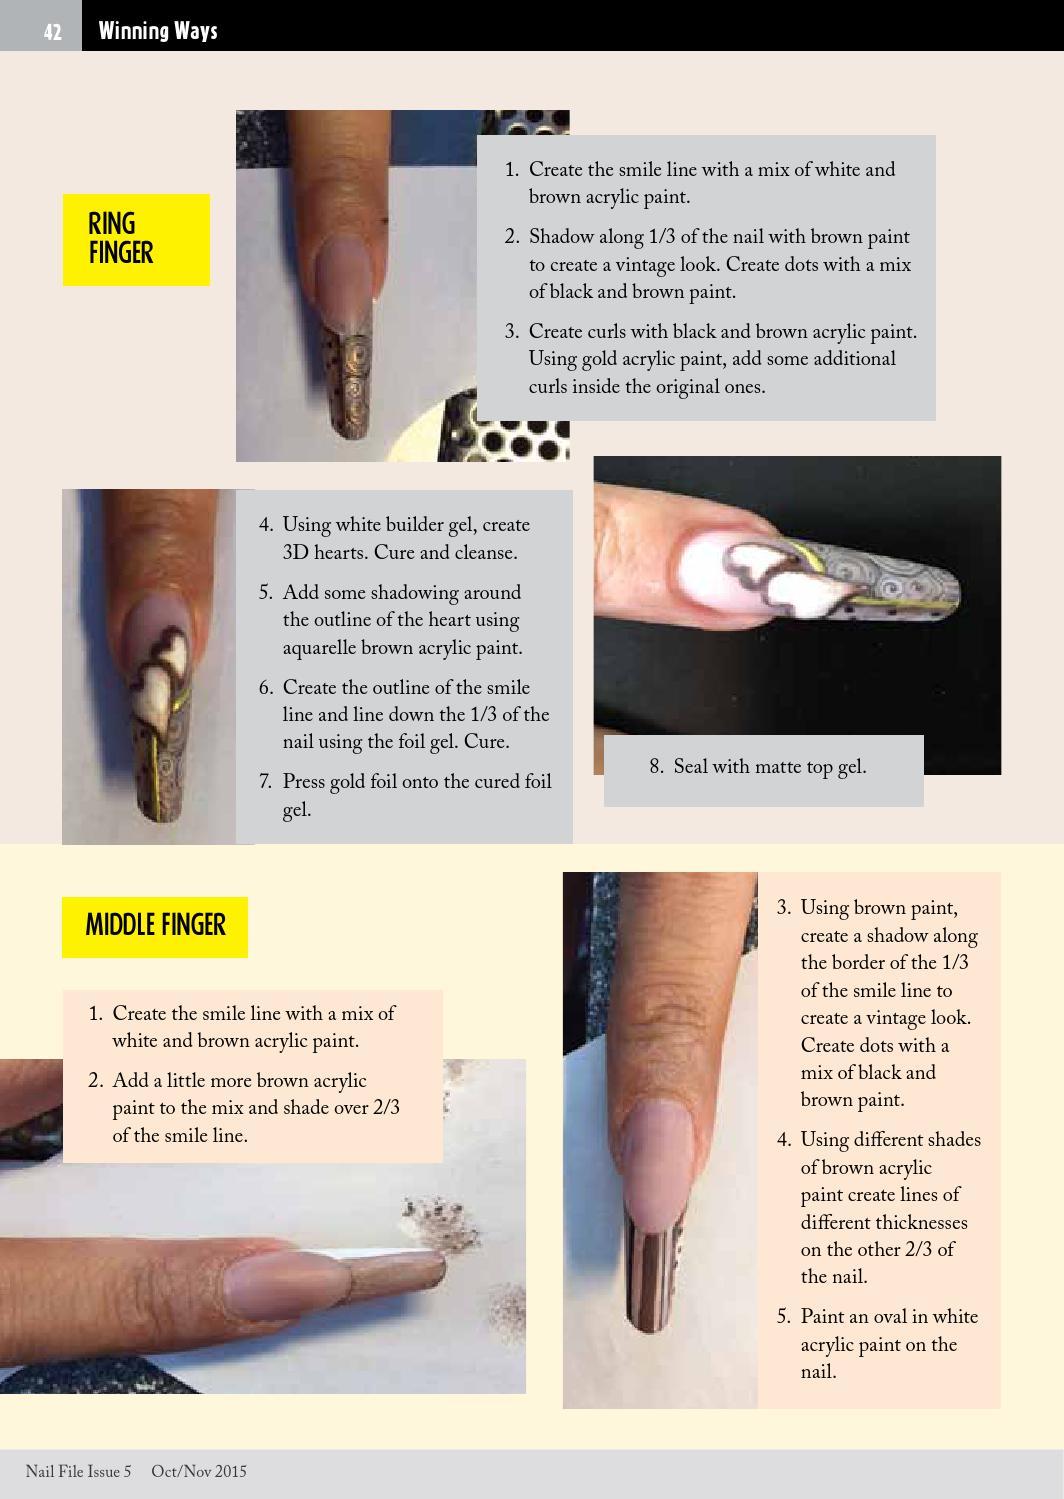 Nail File 1 5 Oct-Nov by Professional Beauty SA - issuu